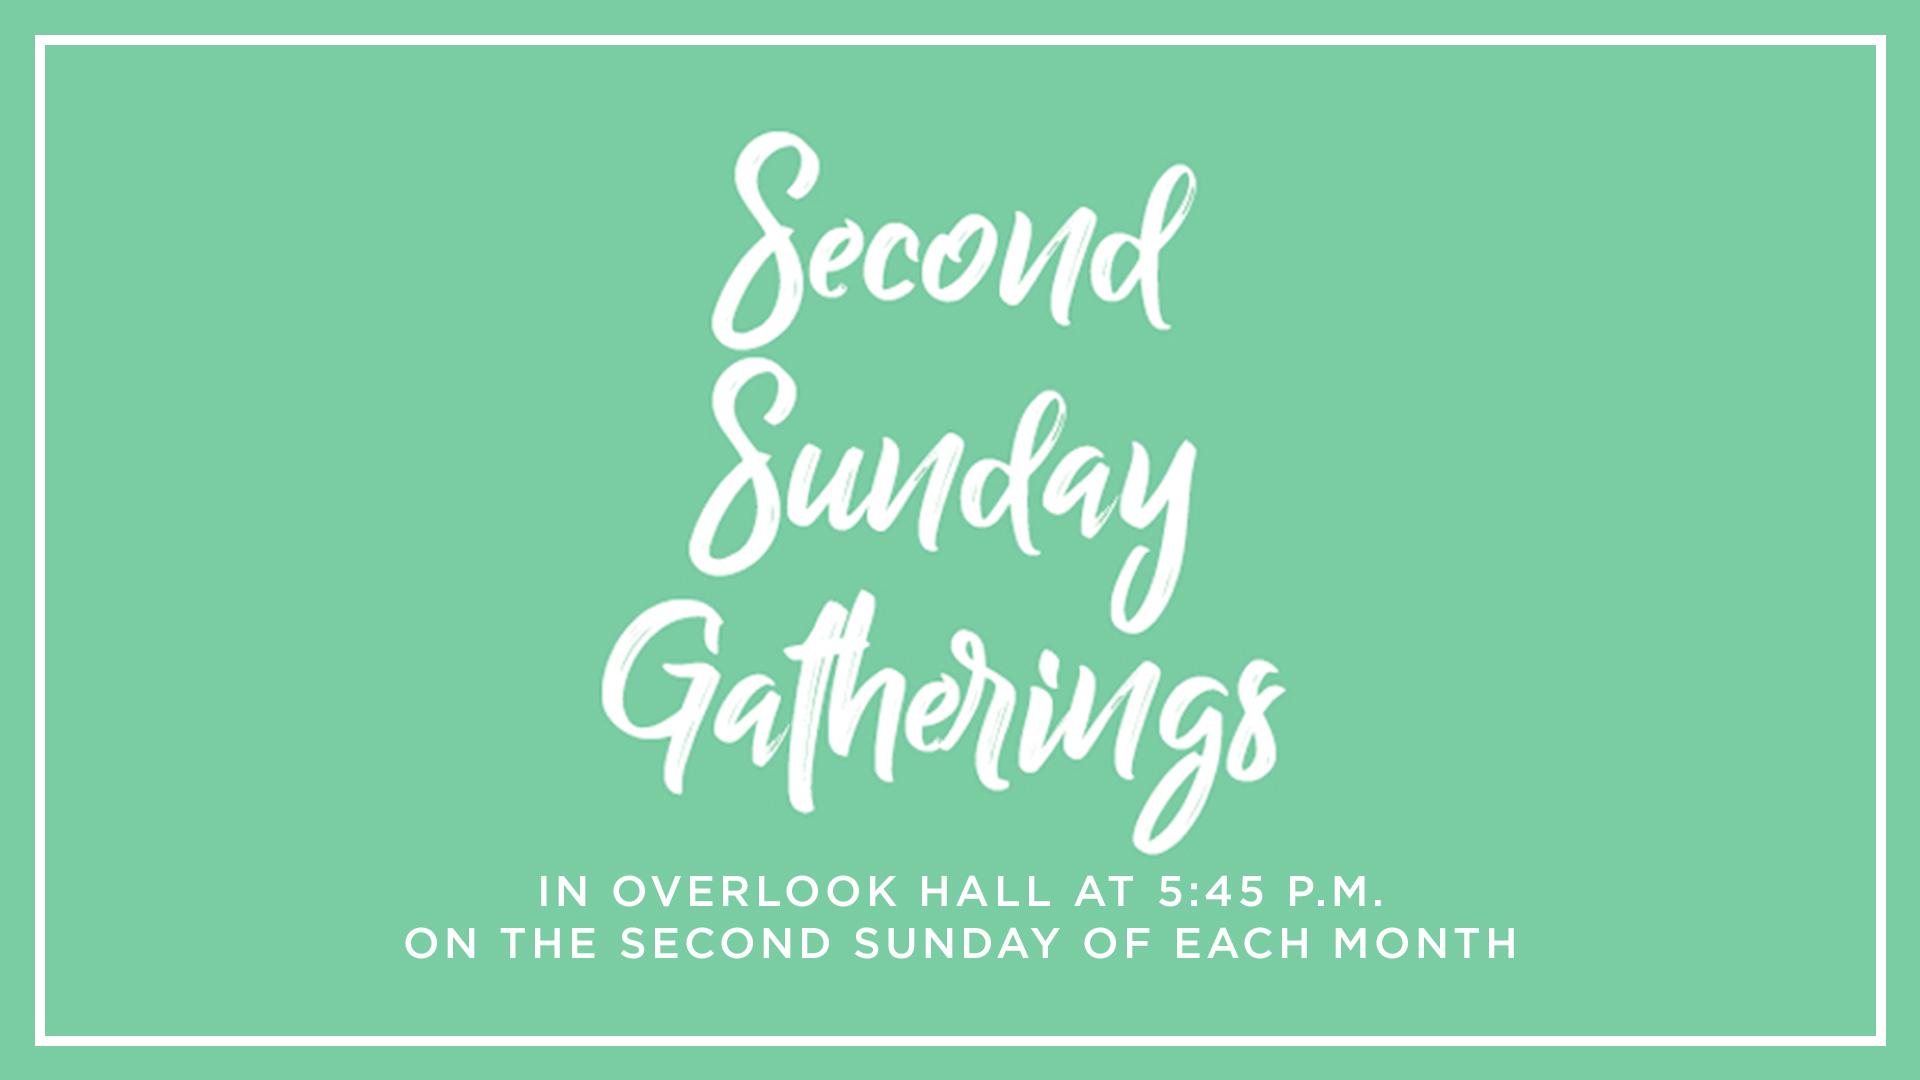 Second Sunday Gatherings.jpg